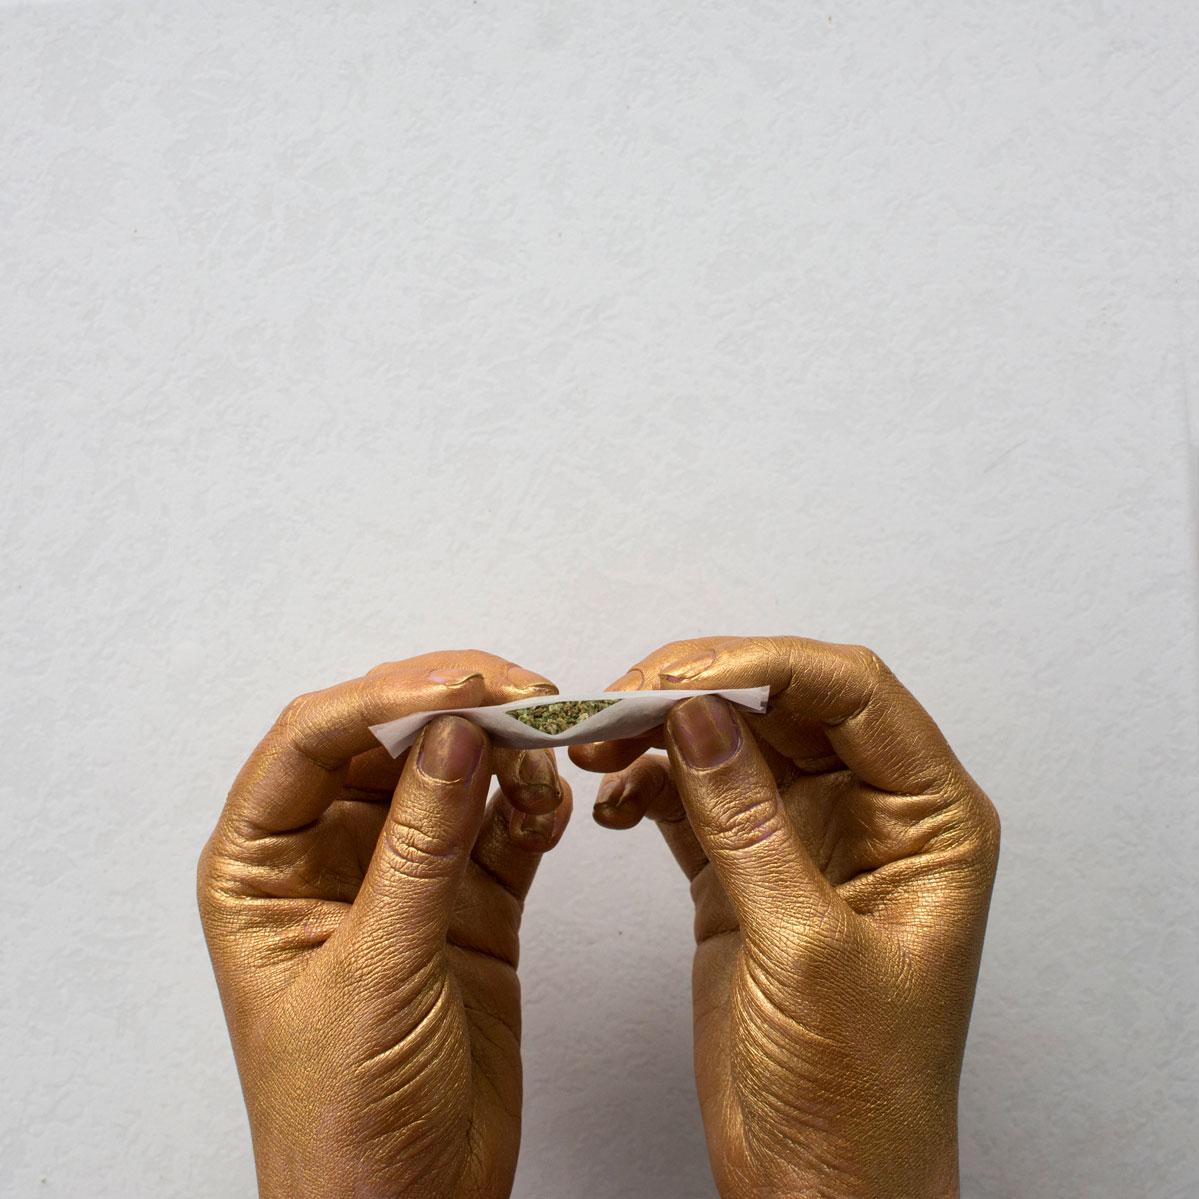 joint-gold-hands-above-greenandgold.jpg